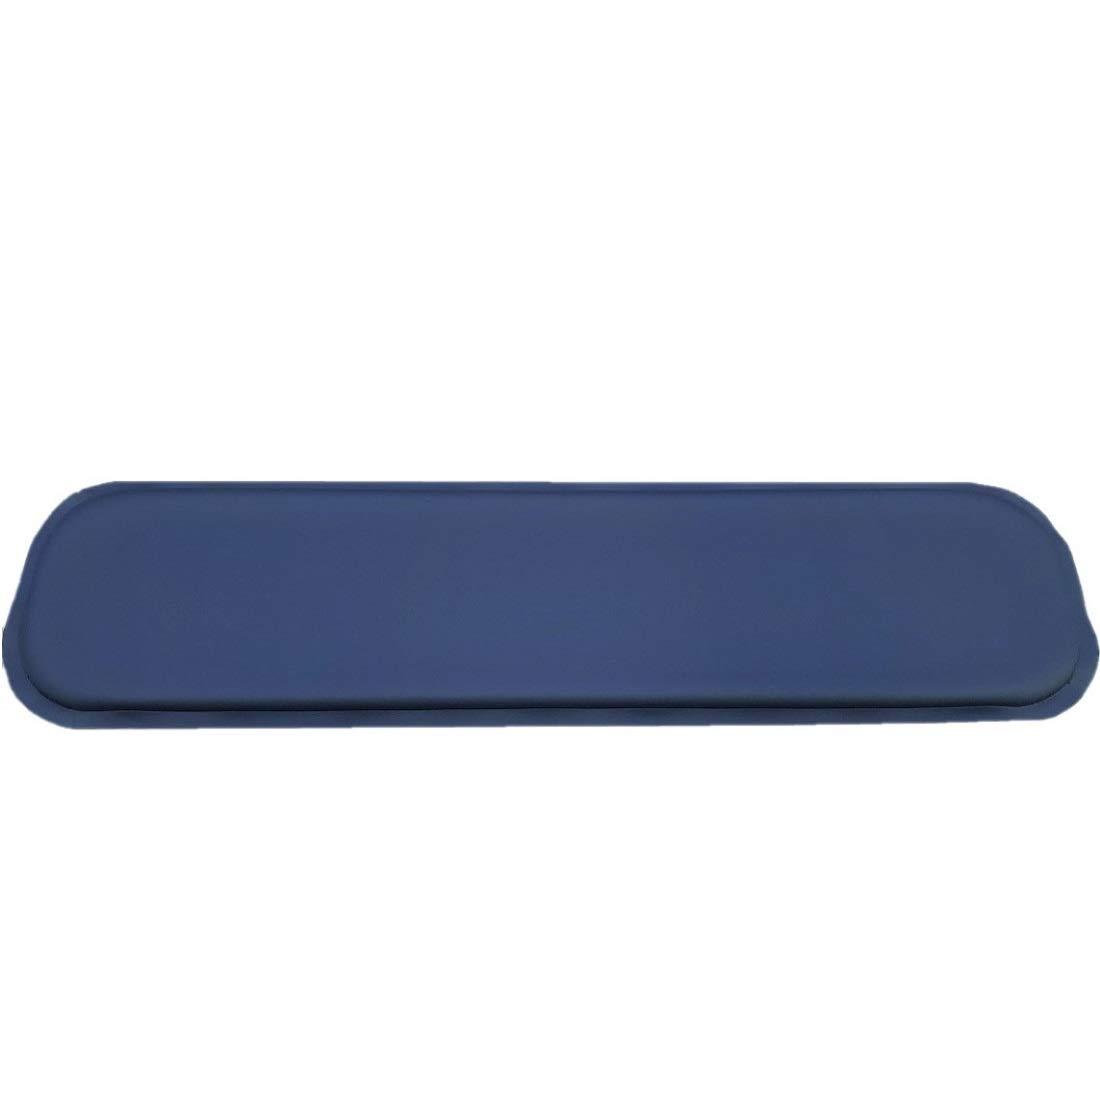 ULTRAGEL''Gaming'' Super Comfy Arm/Elbow/Wrist Rest Gel Pad (Lap Top 4.5x15.5, Blue)